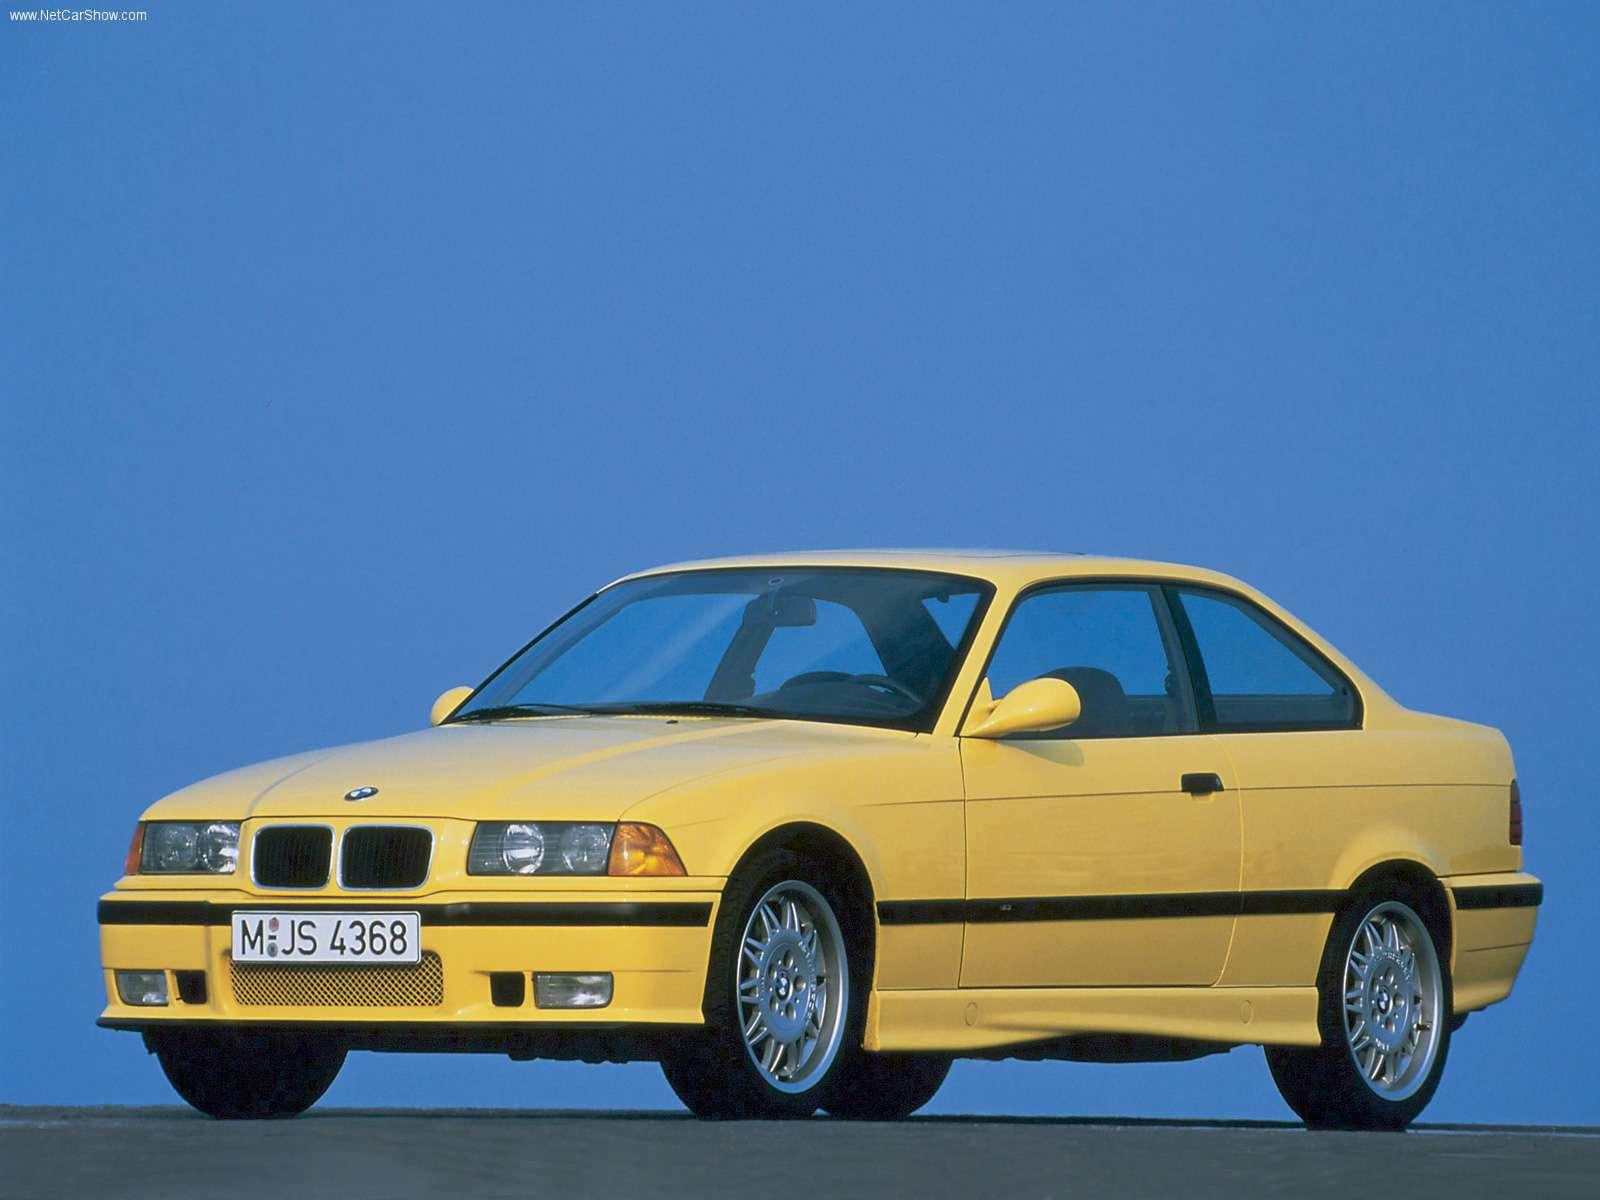 1992 BMW M3 in addition 1977 Datsun 280Z additionally 2001 BMW 325I Camshaft Position Sensor further Mercedes 380SL Vacuum Diagram further BMW 20 Pin Connector Diagram. on bmw bosch alternator wiring diagram